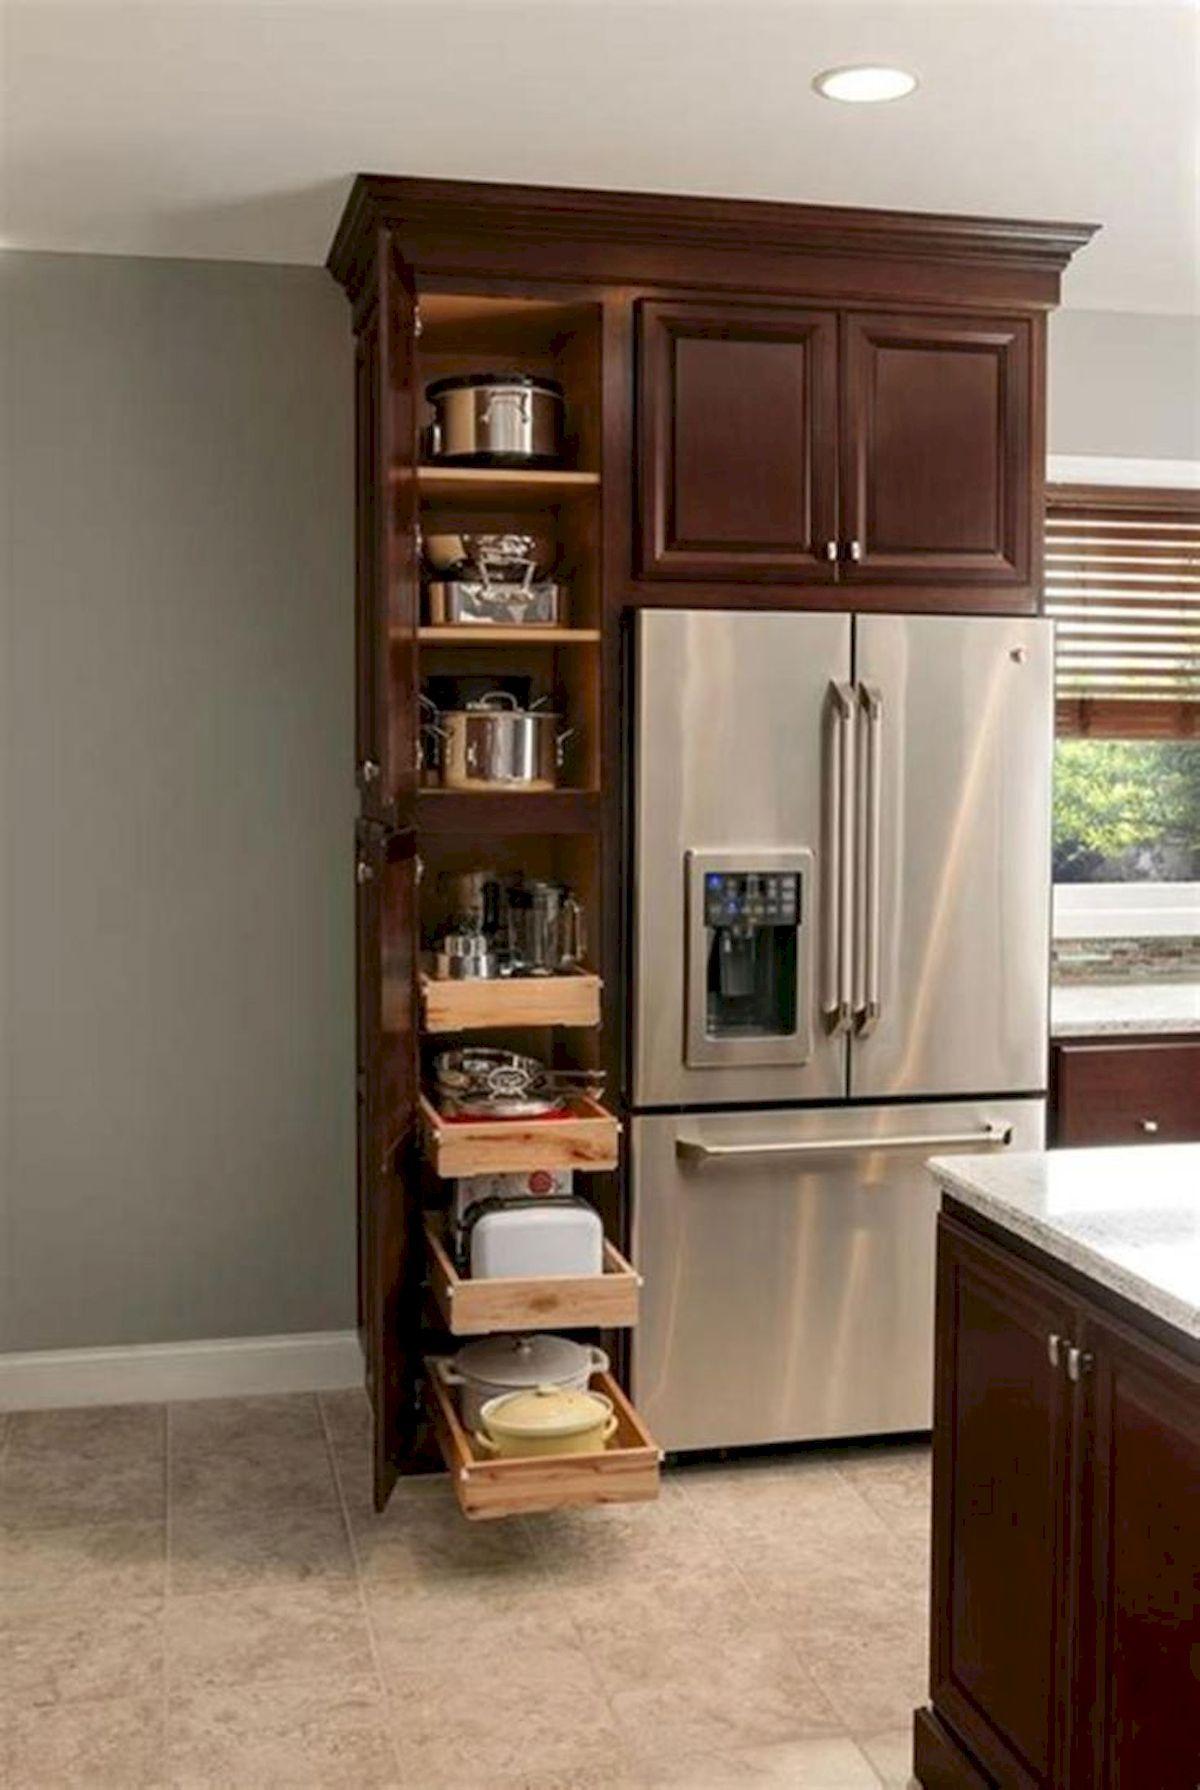 Kitchen Cabinets Design Ideas For A Great Looking Kitchen Kitchen Remodel Small Kitchen Cabinet Storage Diy Kitchen Cabinets